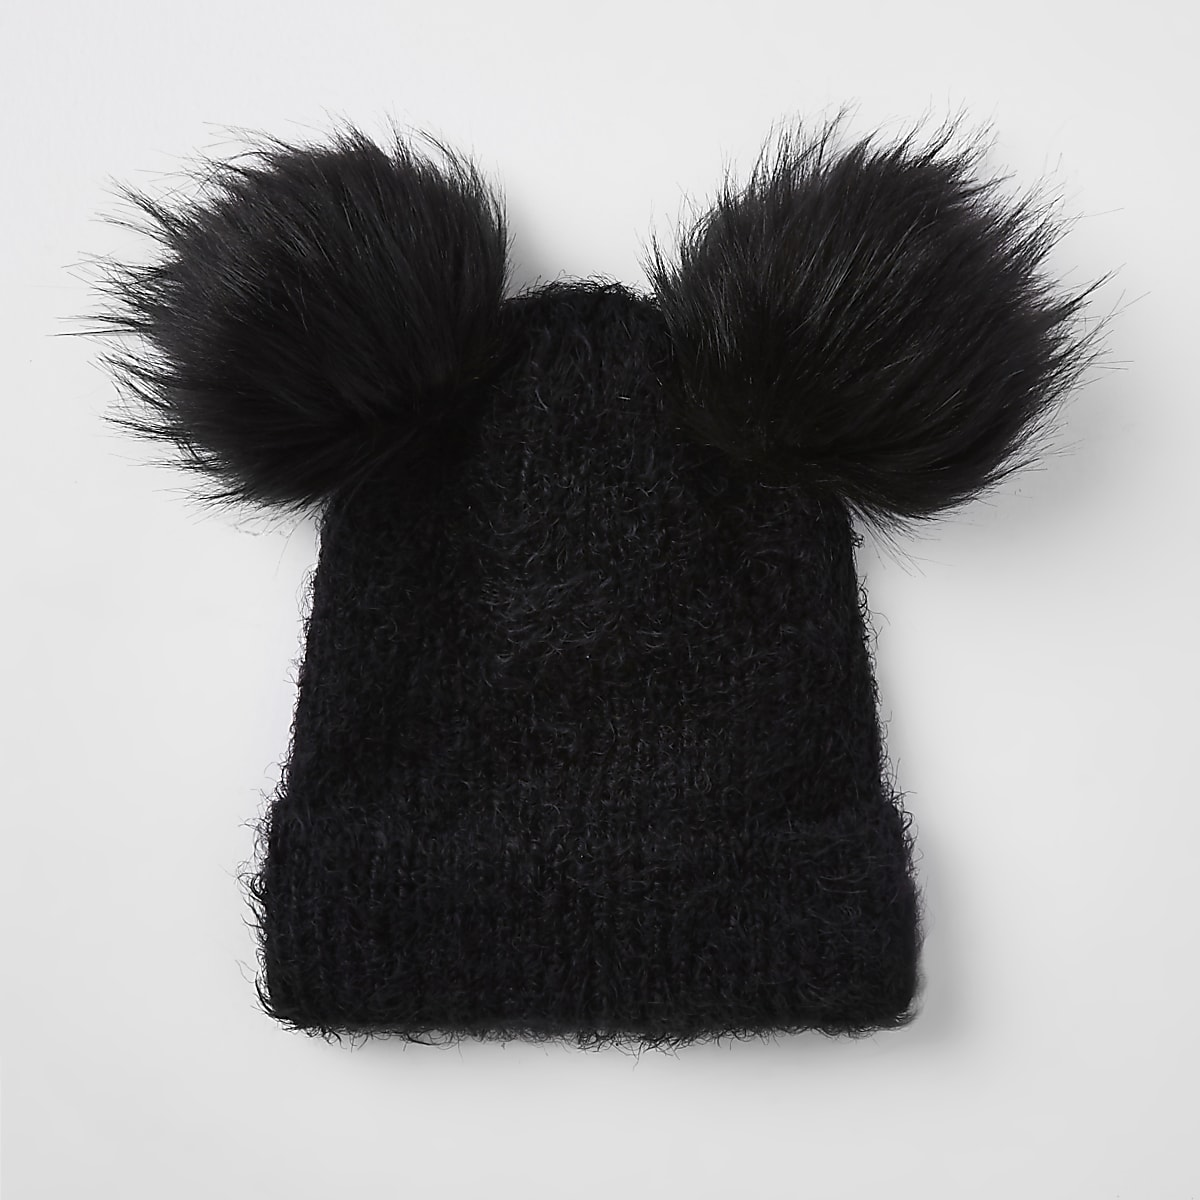 c05d4c95 Black double pom pom beanie hat - Hats - Accessories - women